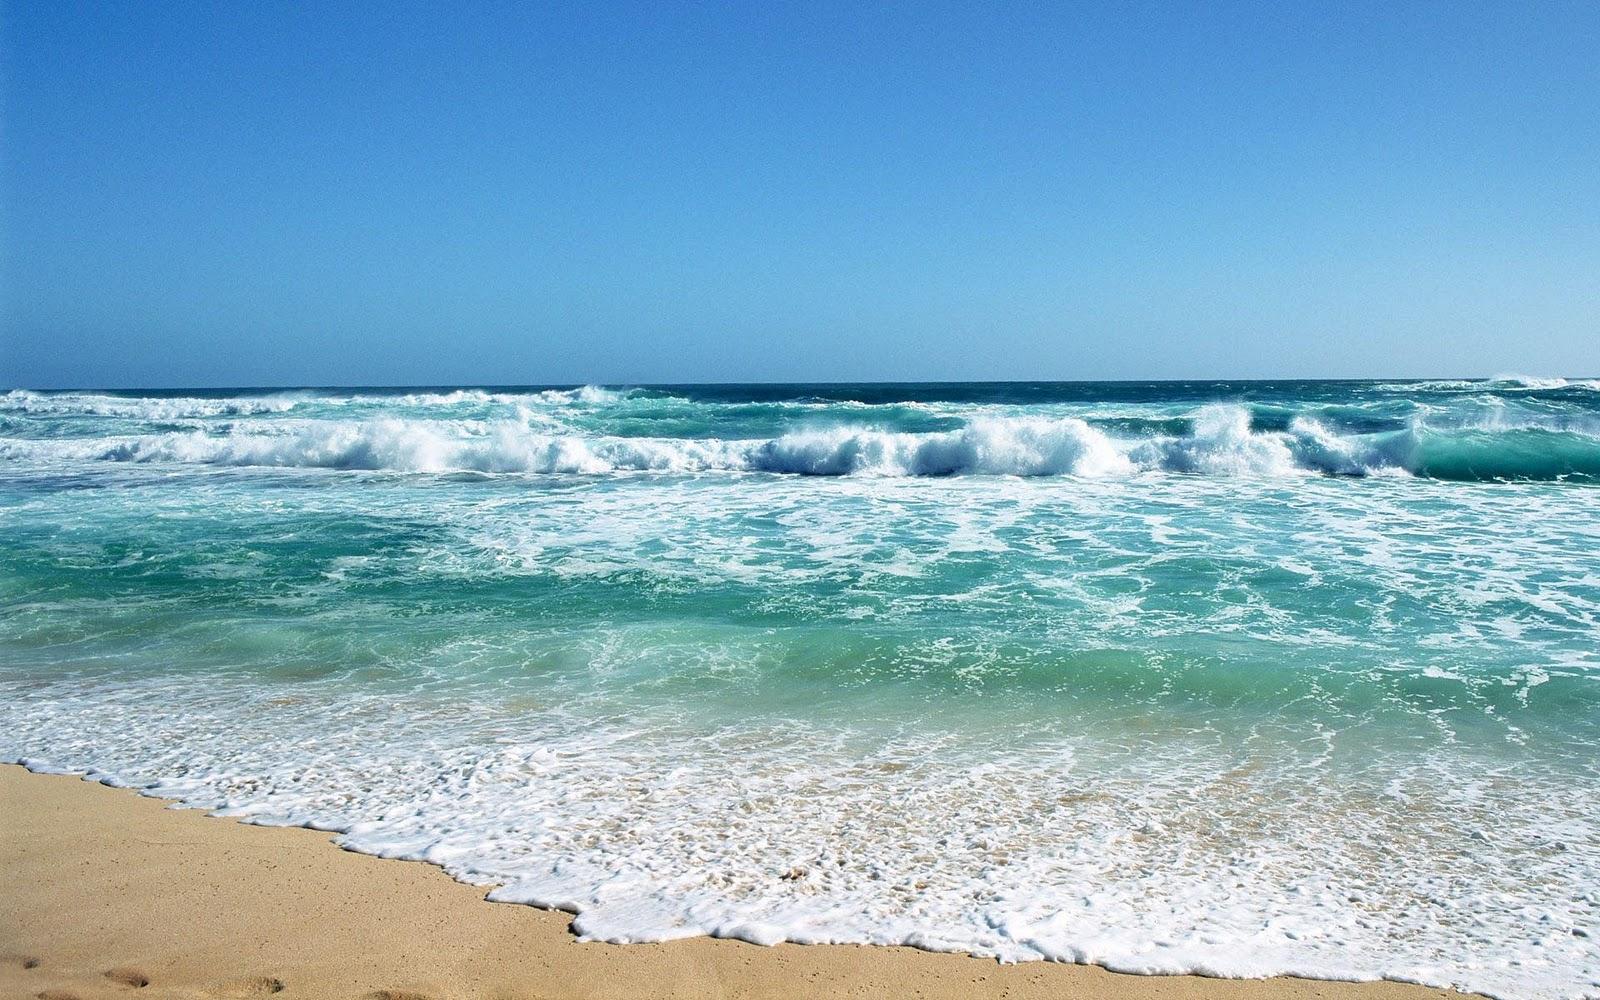 Google Desktop Wallpaper Hd Sea Beach Hd Wallpaperes New Stylish Wallpaper